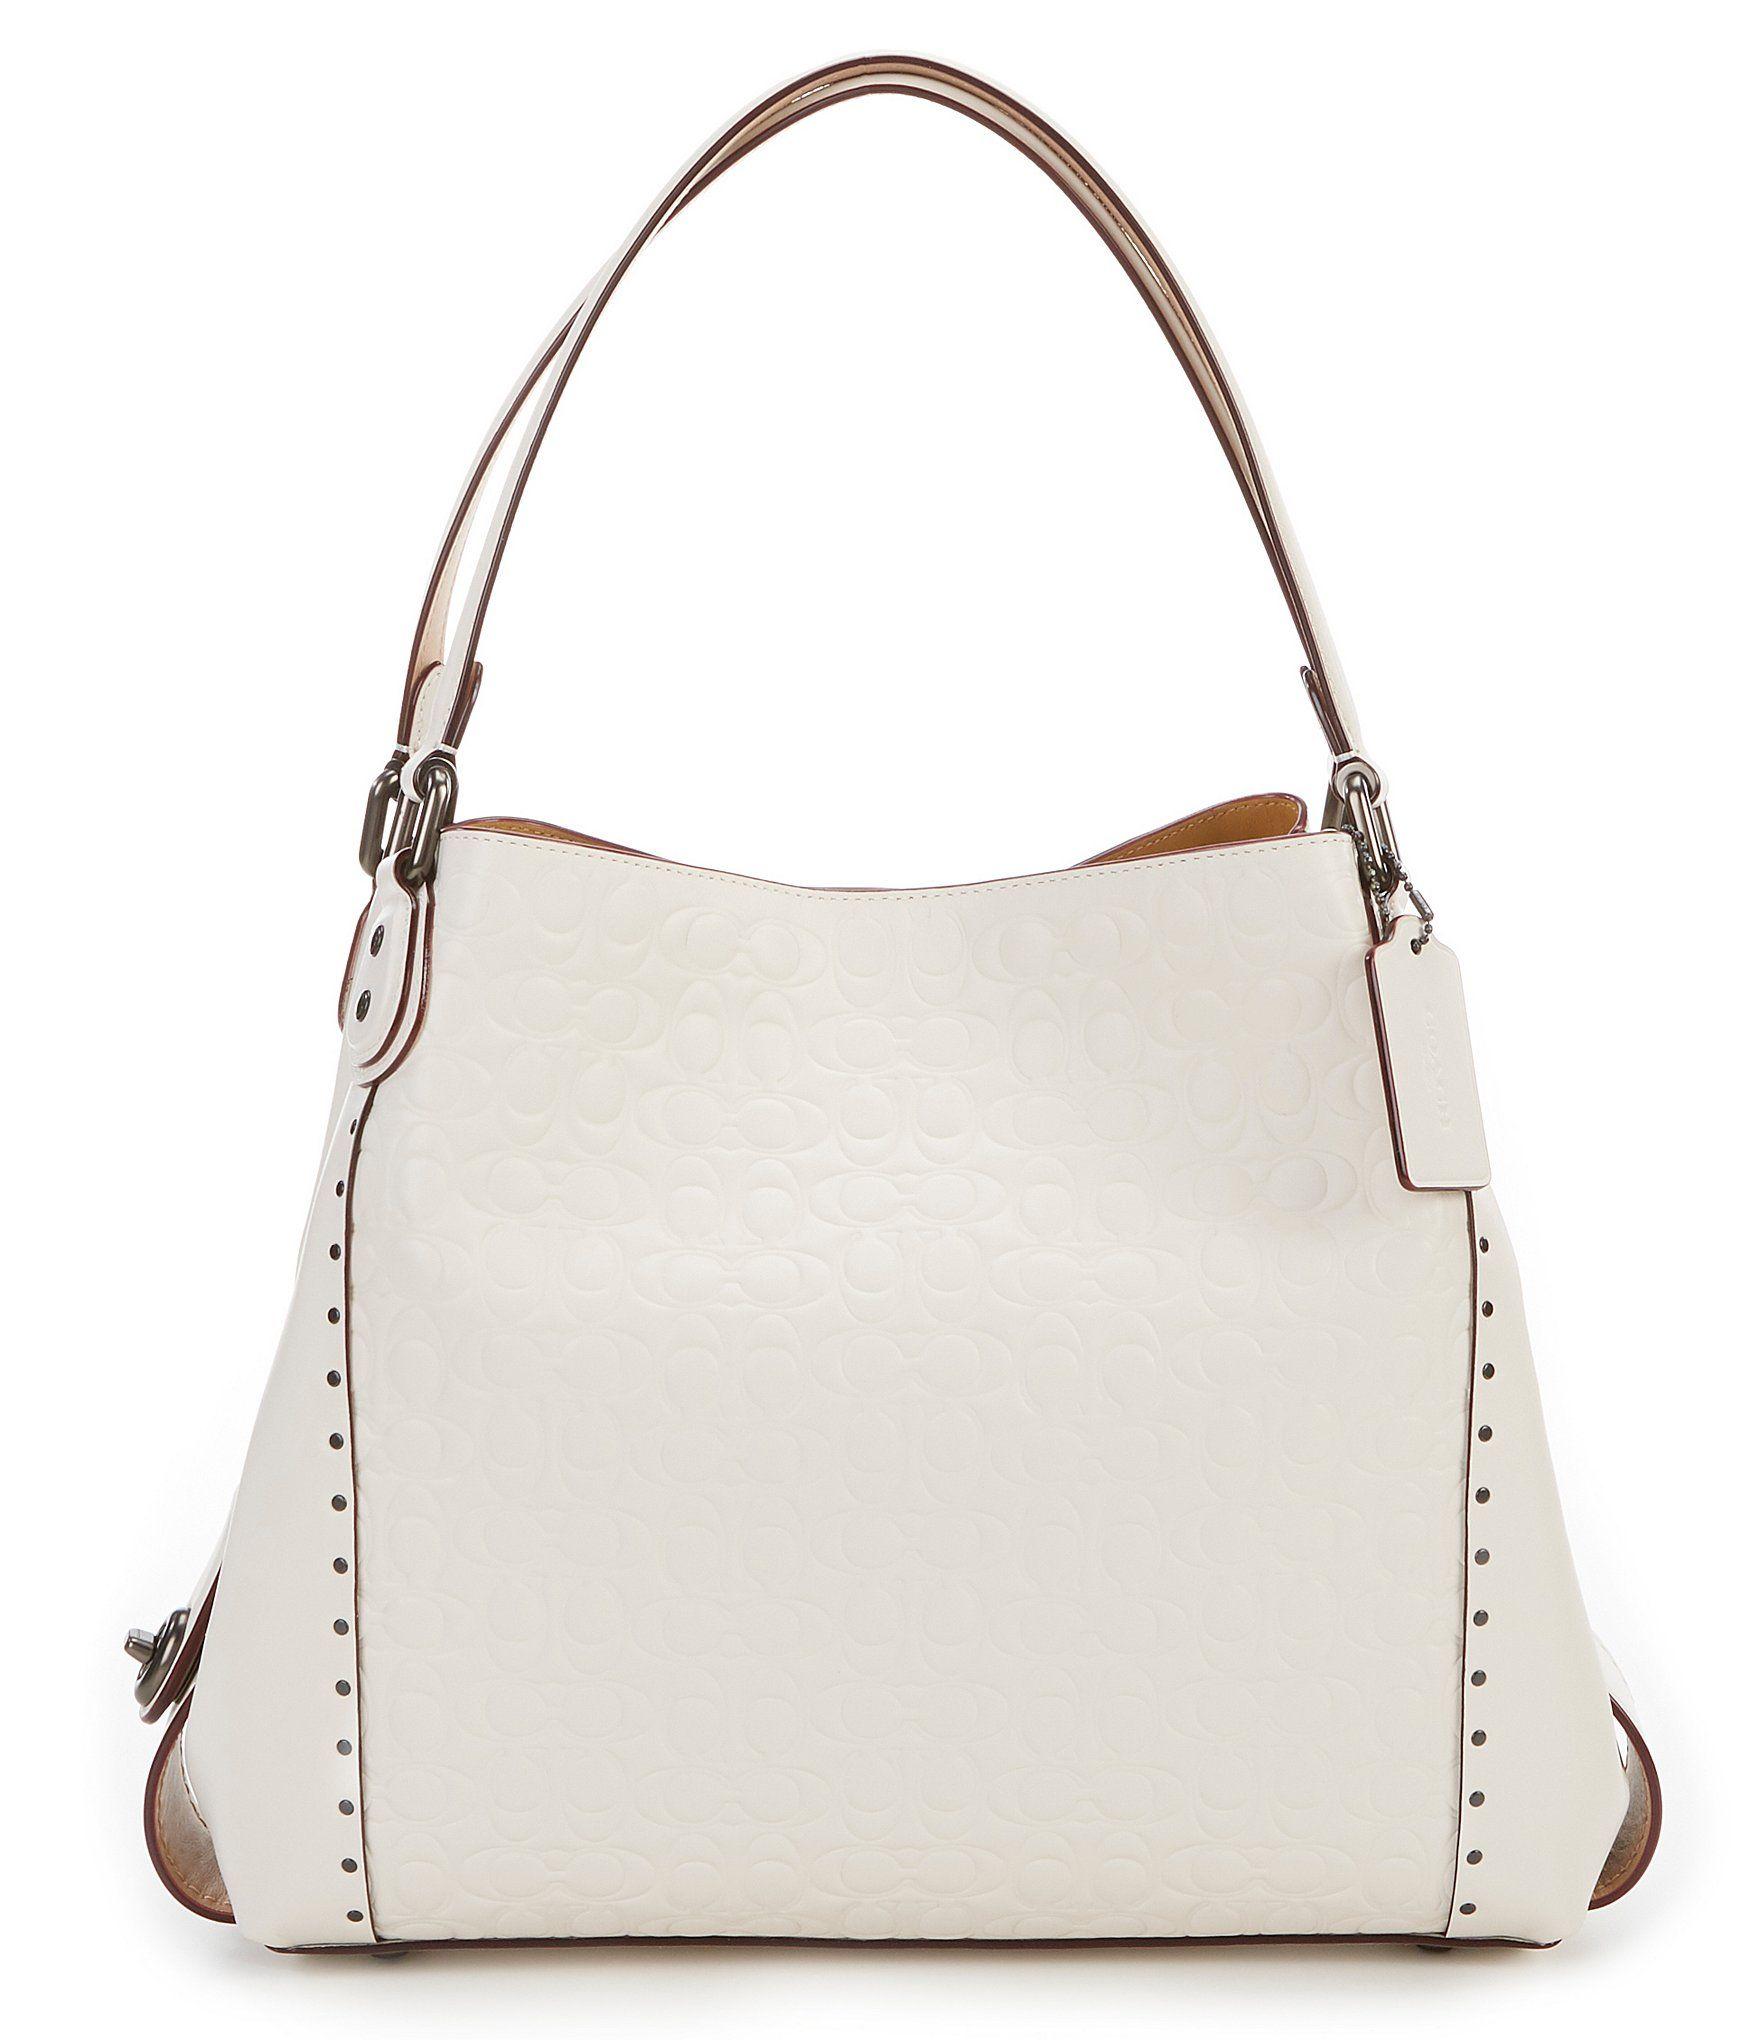 7fd7e637cc6374 COACH SIGNATURE LEATHER EDIE 31 SHOULDER BAG #Dillards Cute Handbags, Coach  Handbags, Dillards